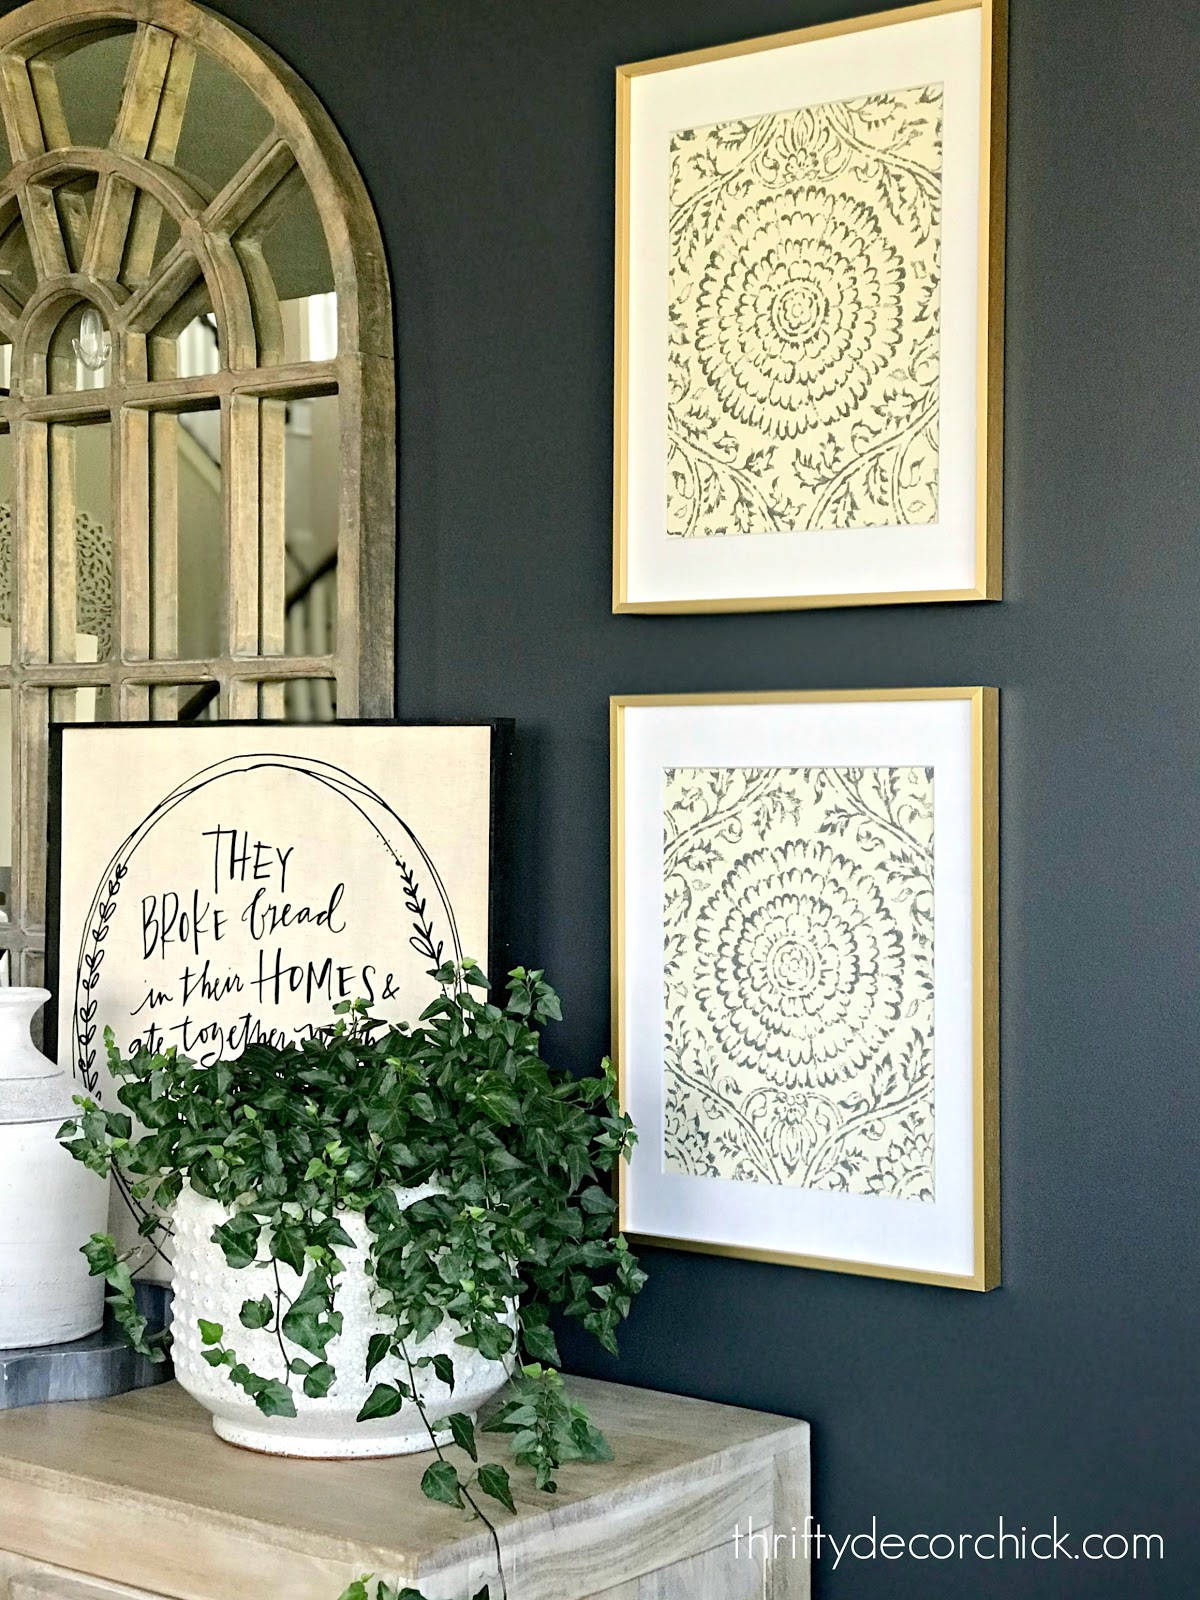 Wallpaper in frames